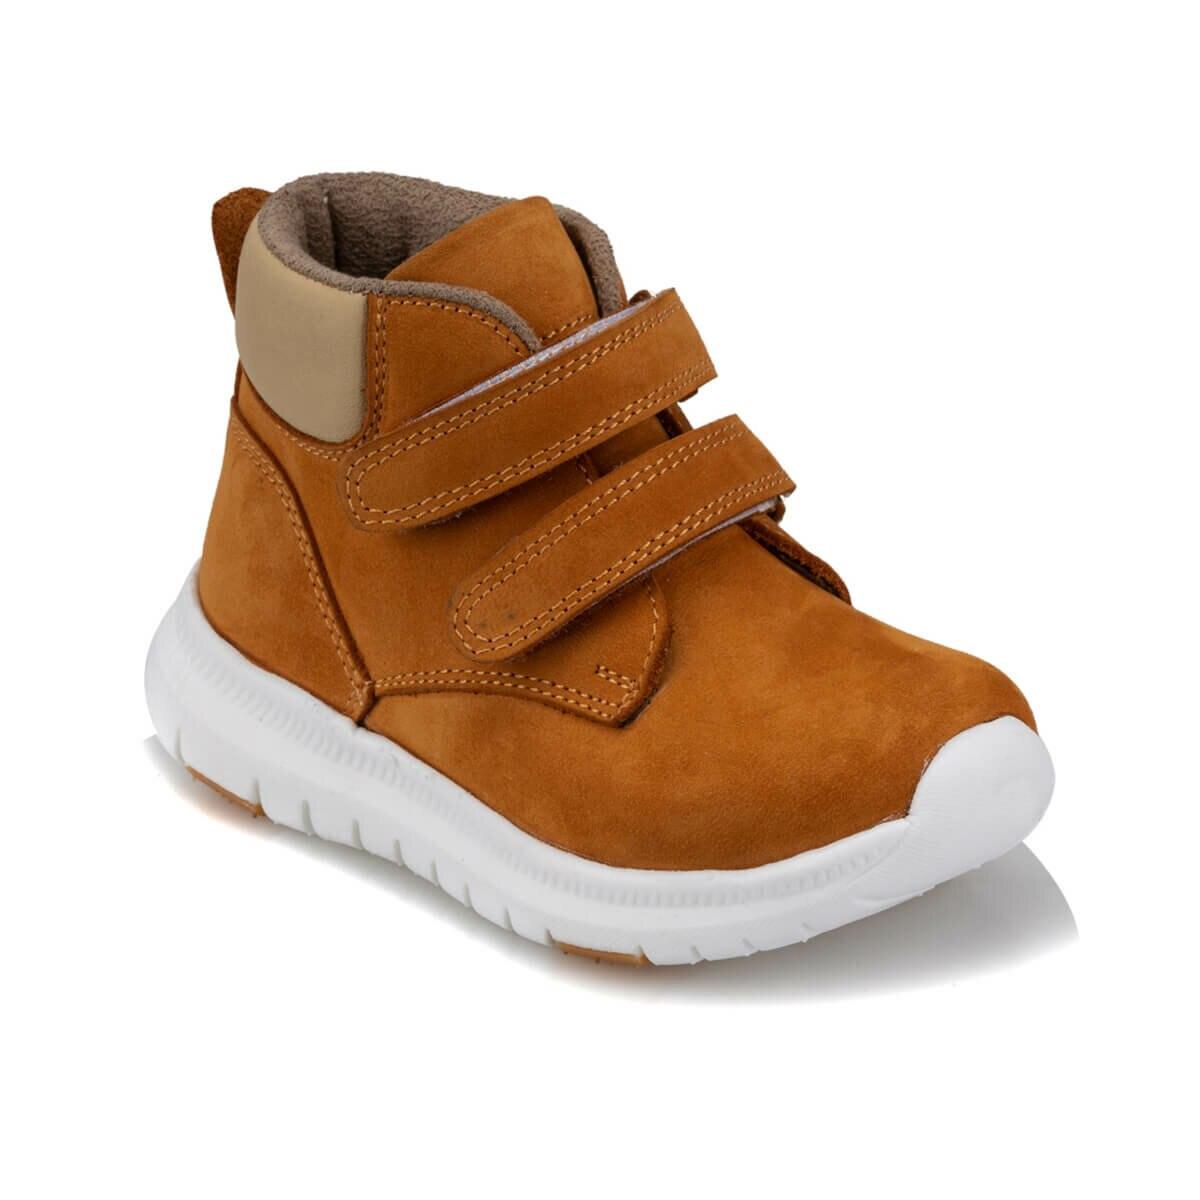 FLO 92.511731.B Camel Male Child Sports Shoes Polaris